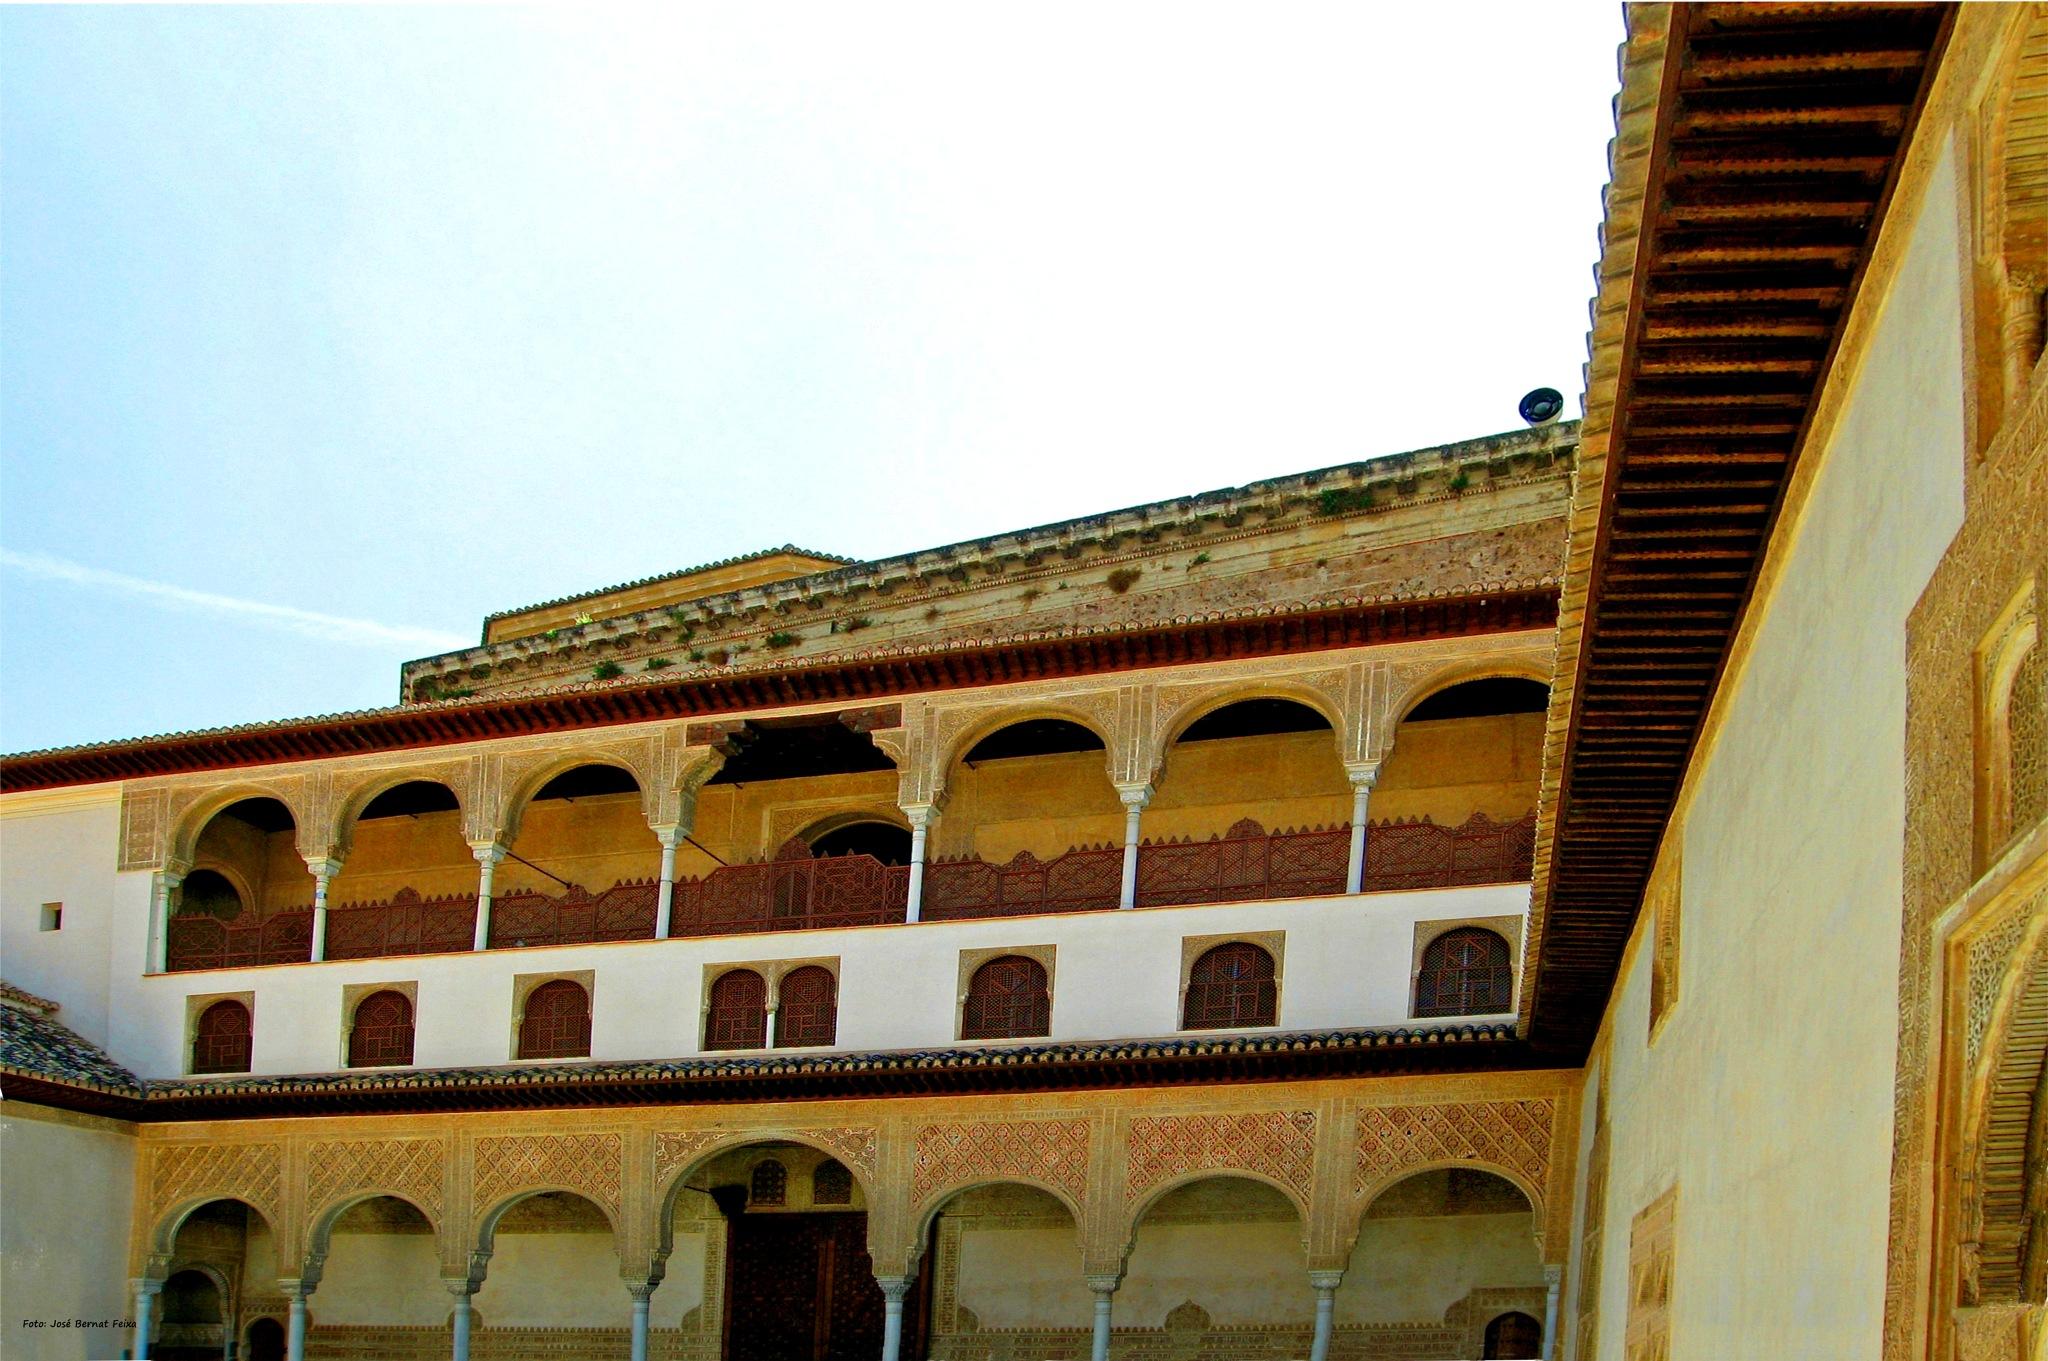 ARQUITECTURA ARÁBIGA ; ARABISCHE ARCHITECTUUR ; ARABIC ARCHITECTURE by José Bernat Feixa